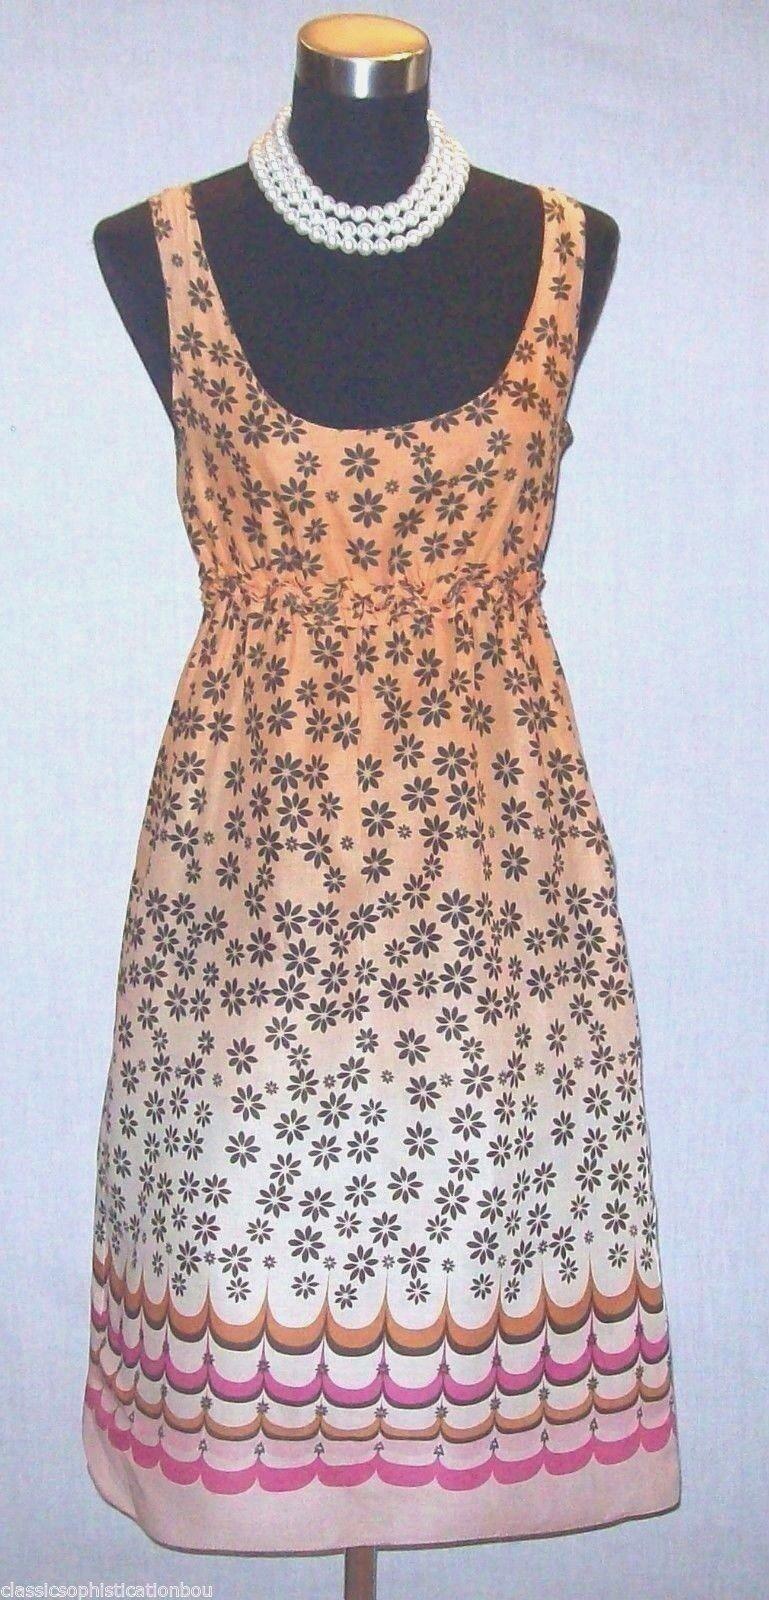 Woherren Max Studio Dress S Fit & Flare braun Beige Rosa Cotton DRESS  NEW